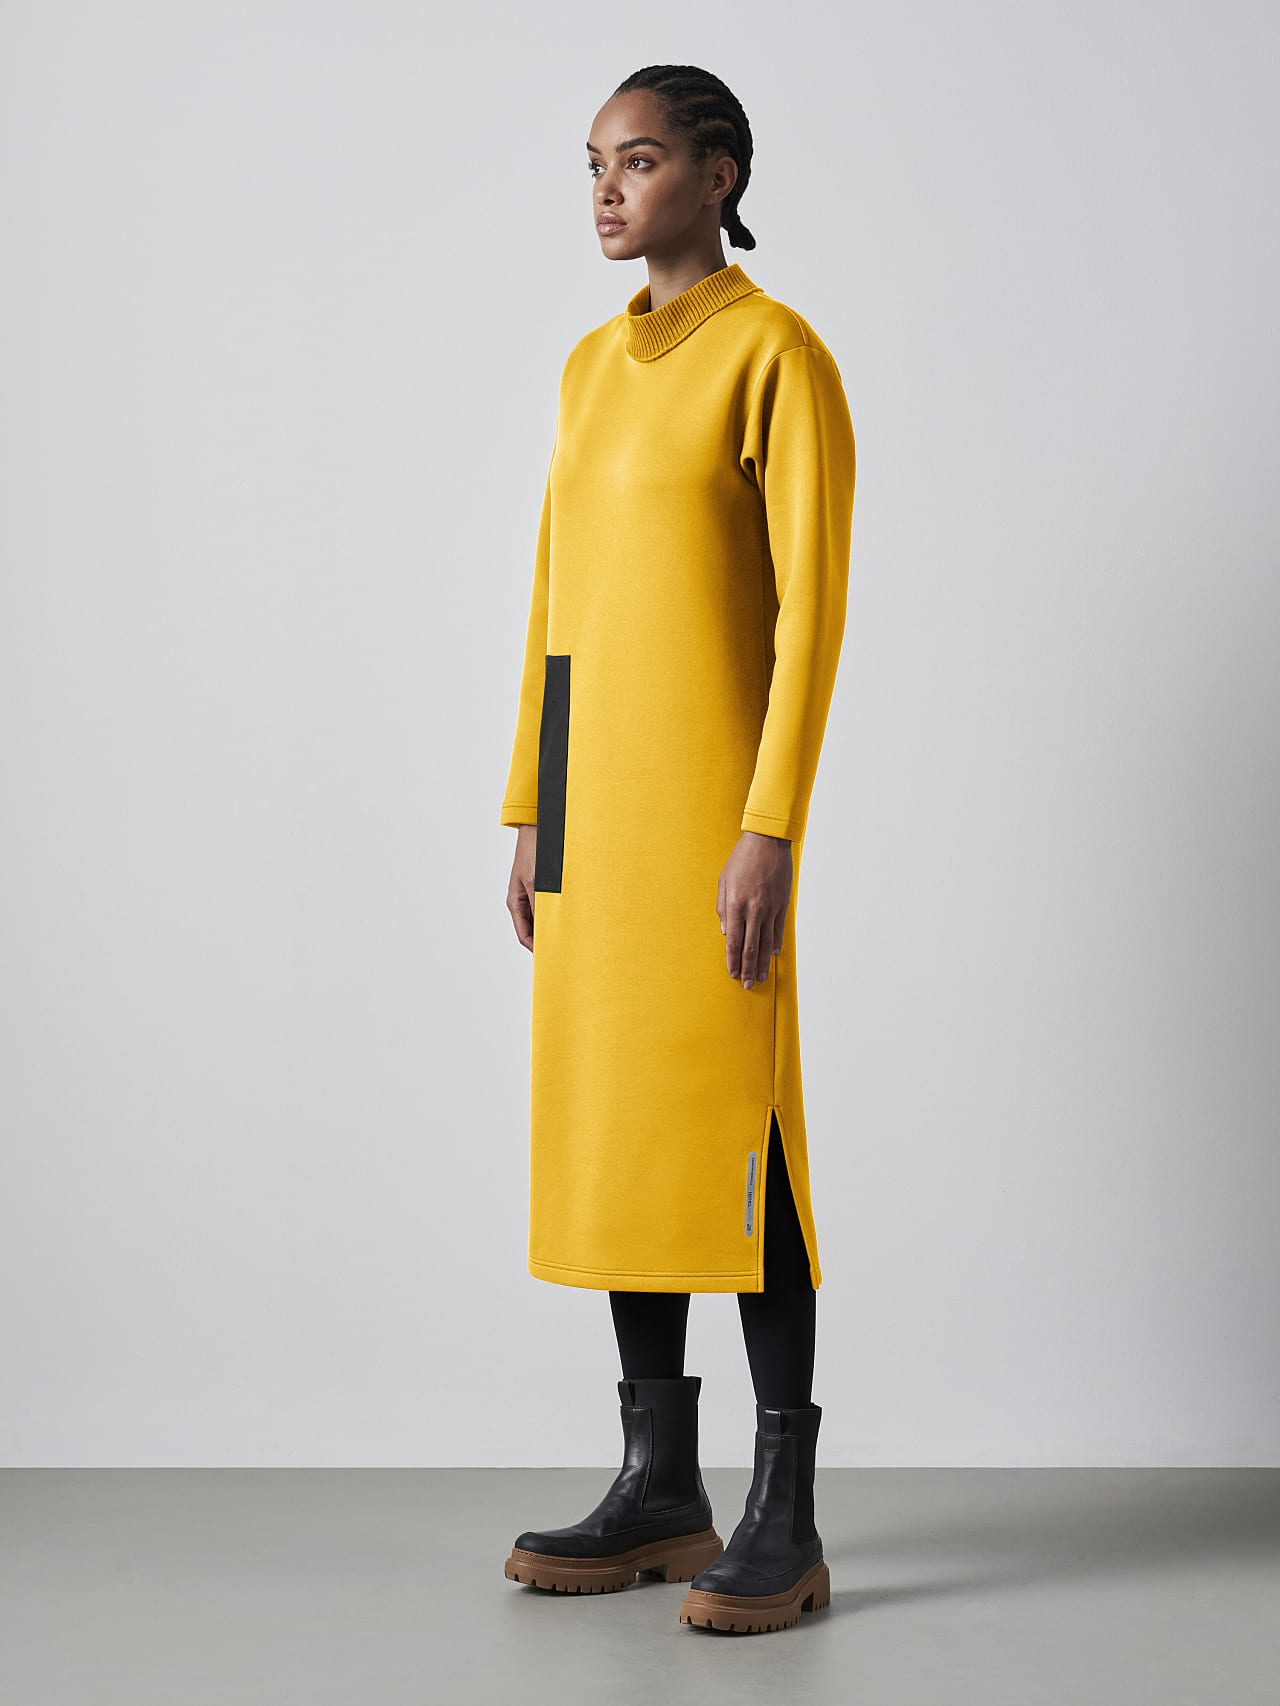 SINLE V1.Y5.02 Technical Spacer Maxi Dress yellow Model shot Alpha Tauri